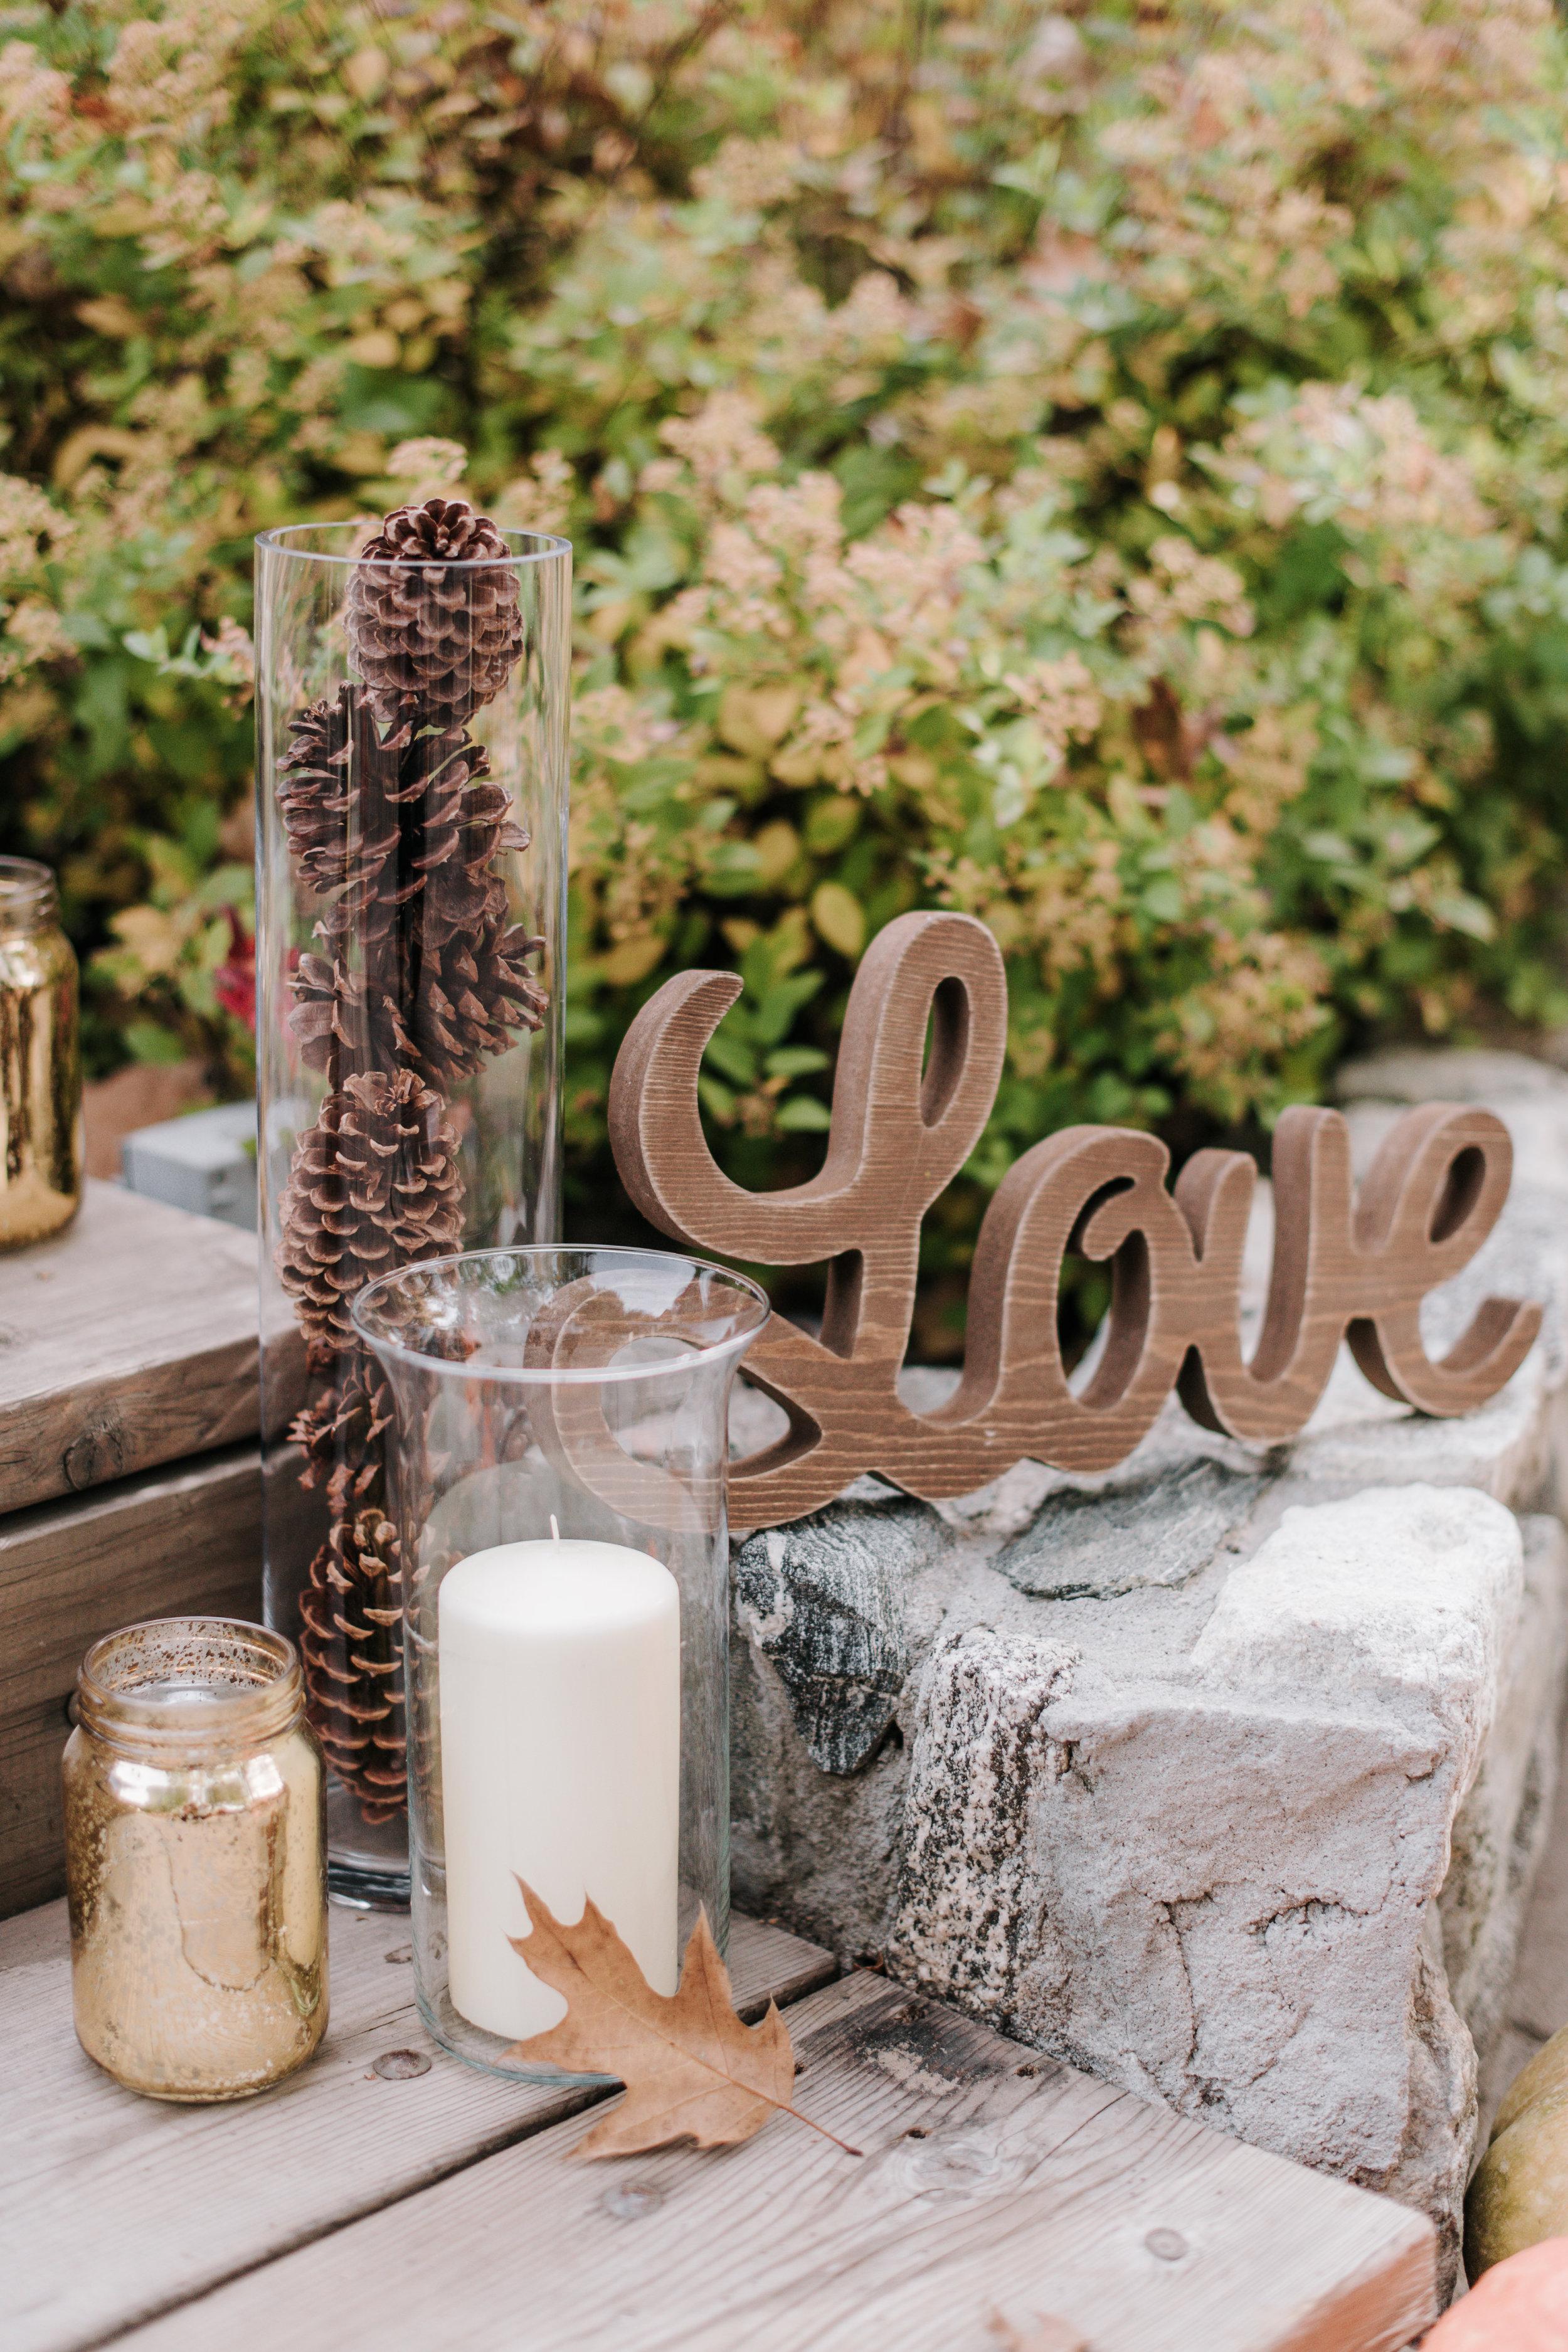 2018-11-04 Maresa and Nick - Married - Oak Glen-473.jpg